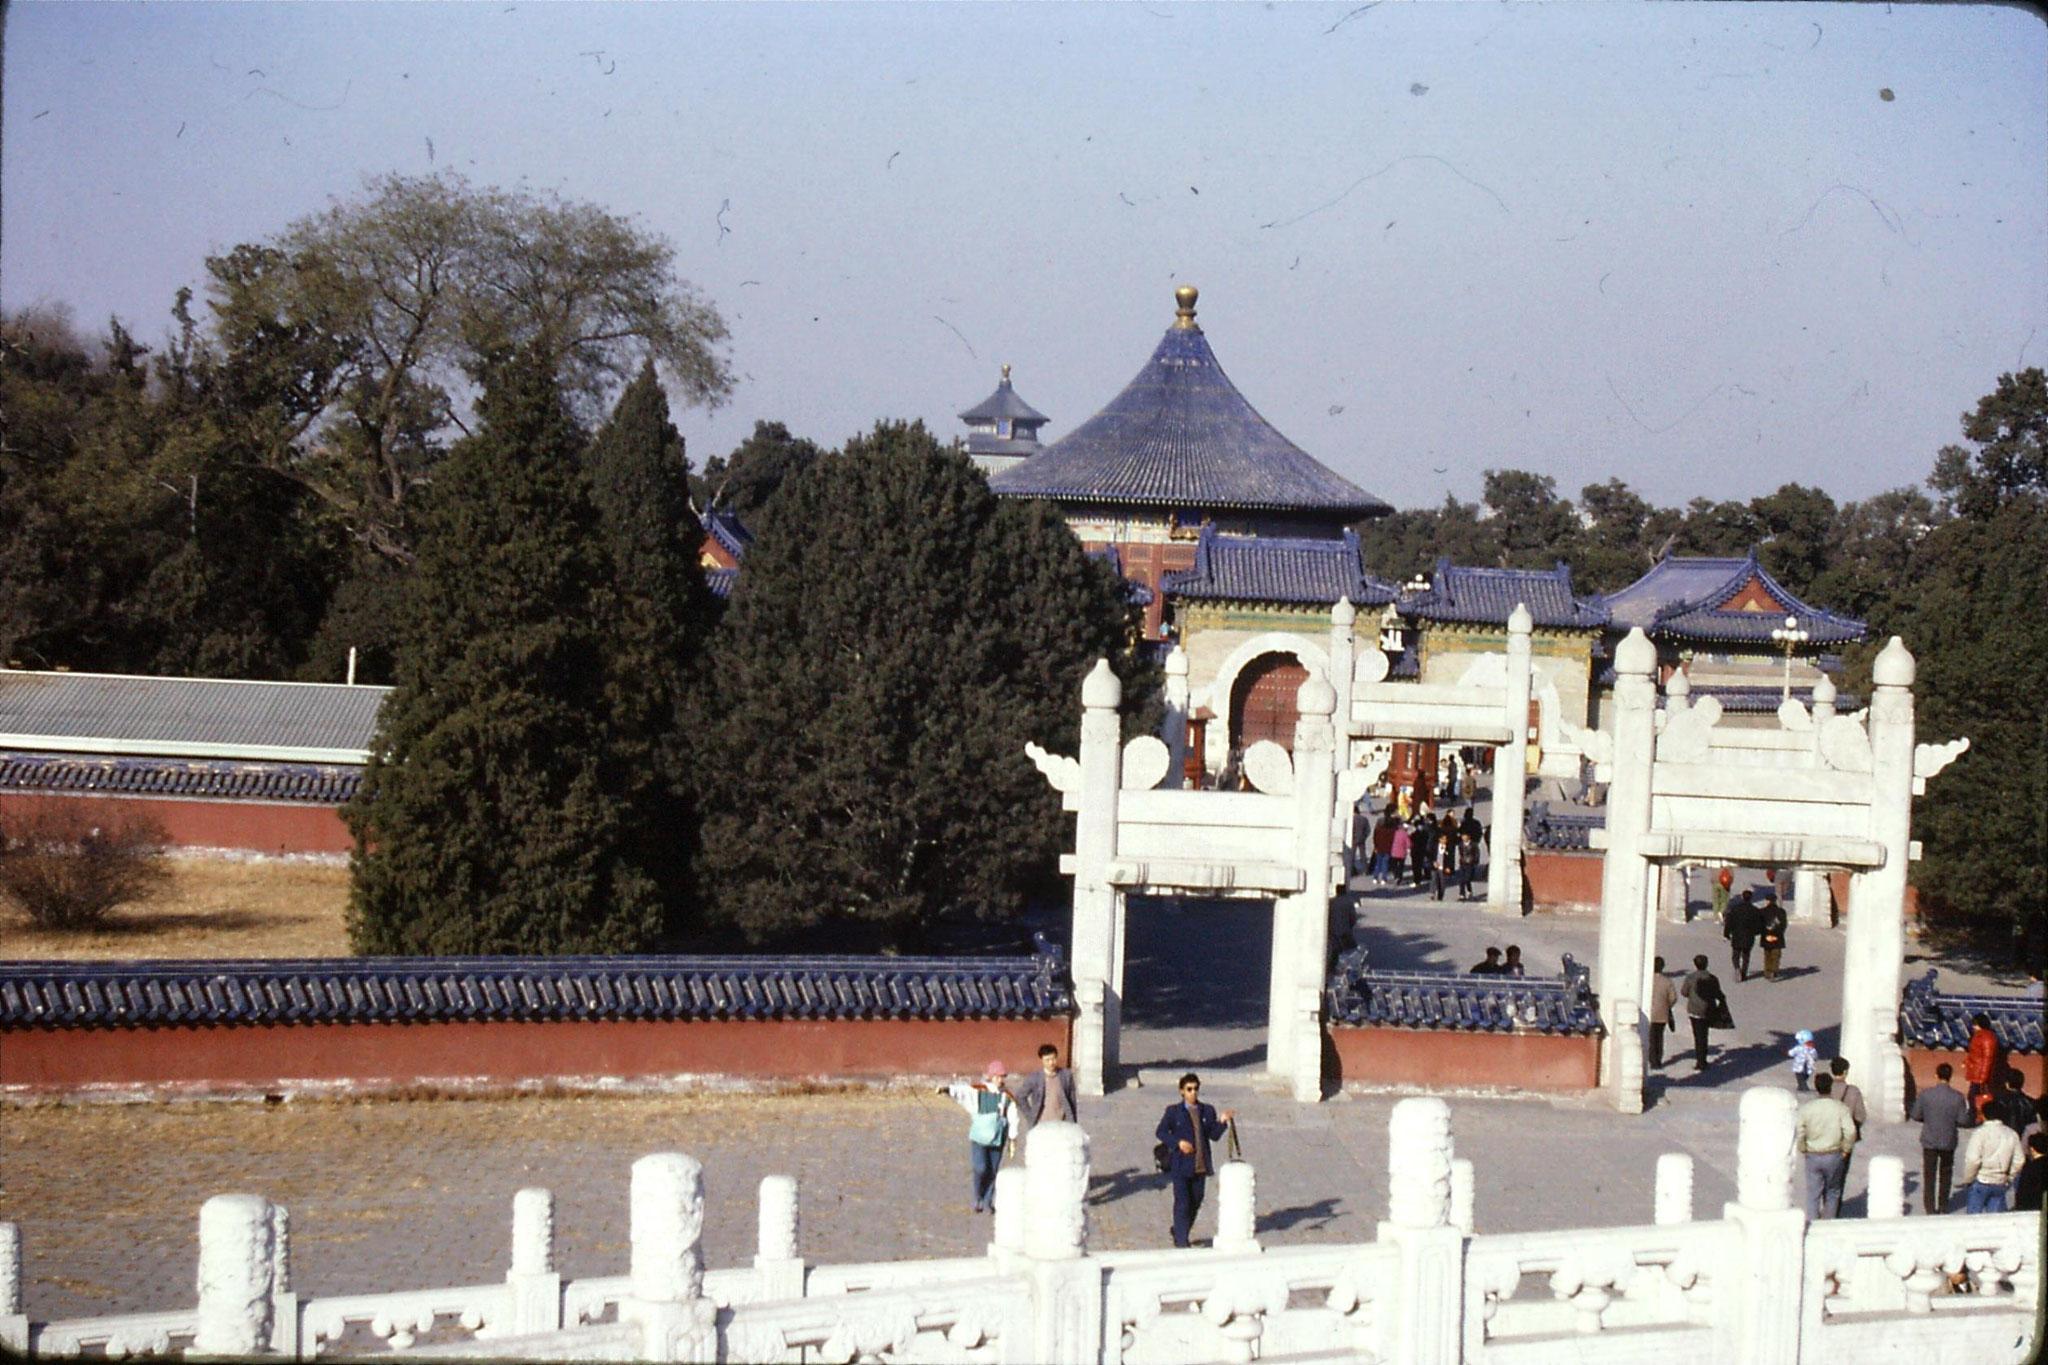 2/12/1988: 15: Tiantan Park